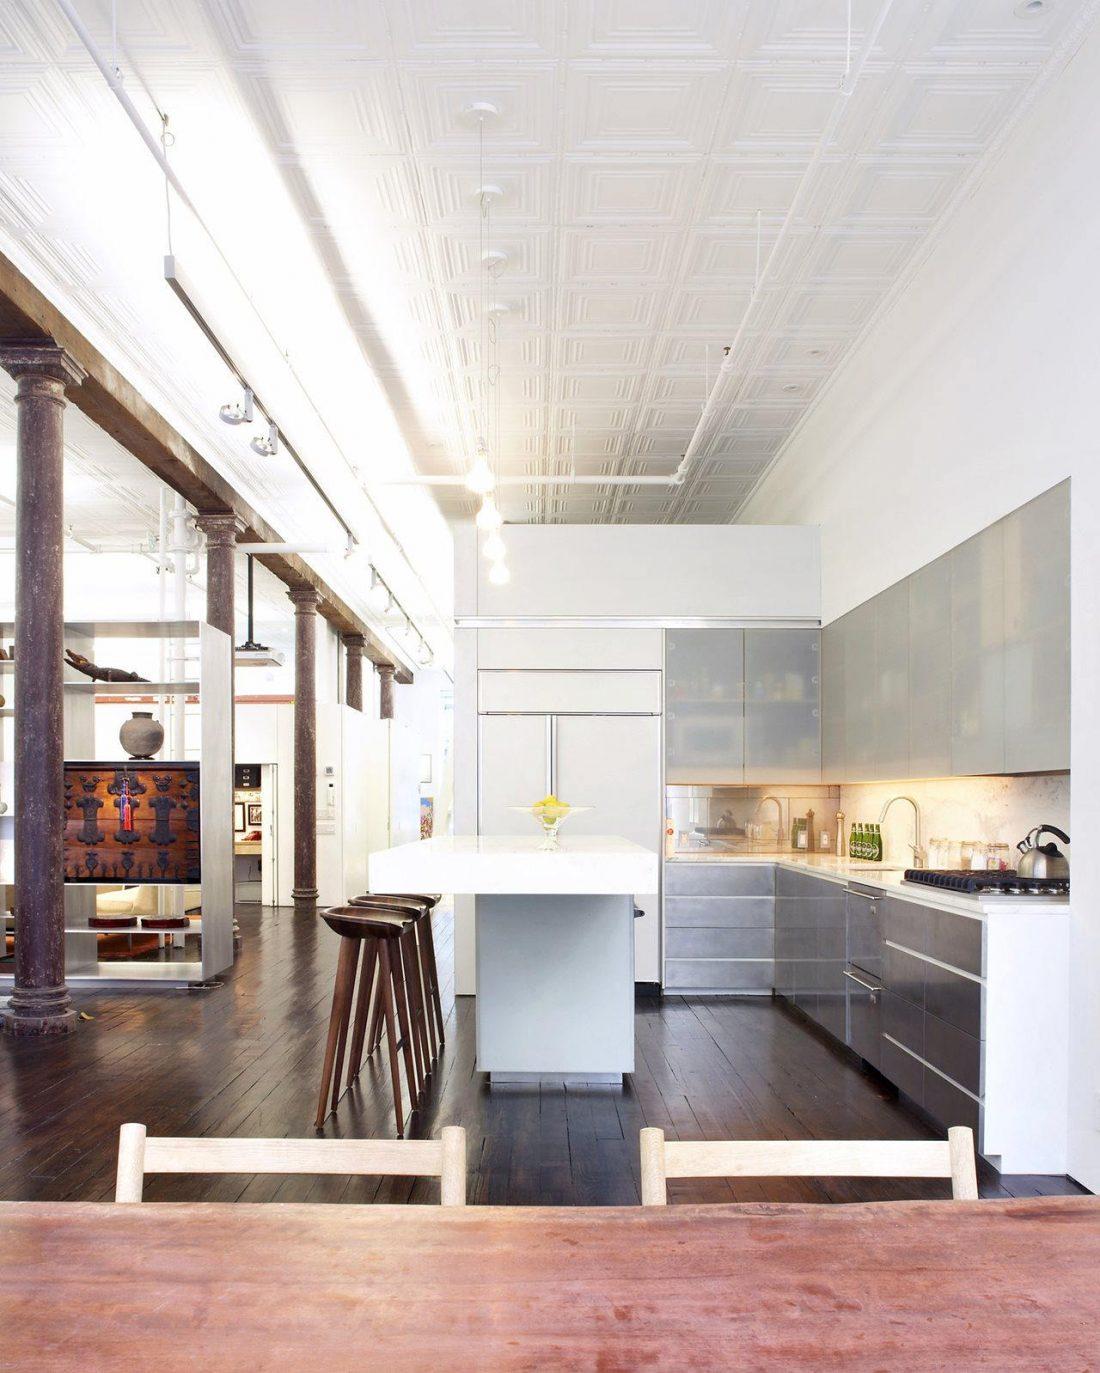 Дизайн интерьера квартиры в стиле лофт 24